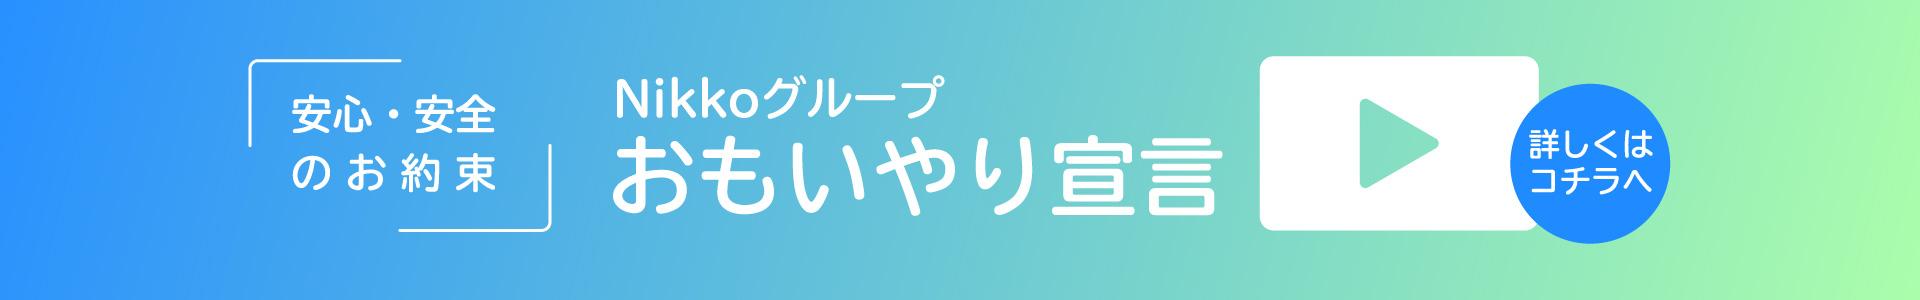 Nikkoグループおもいやり宣言